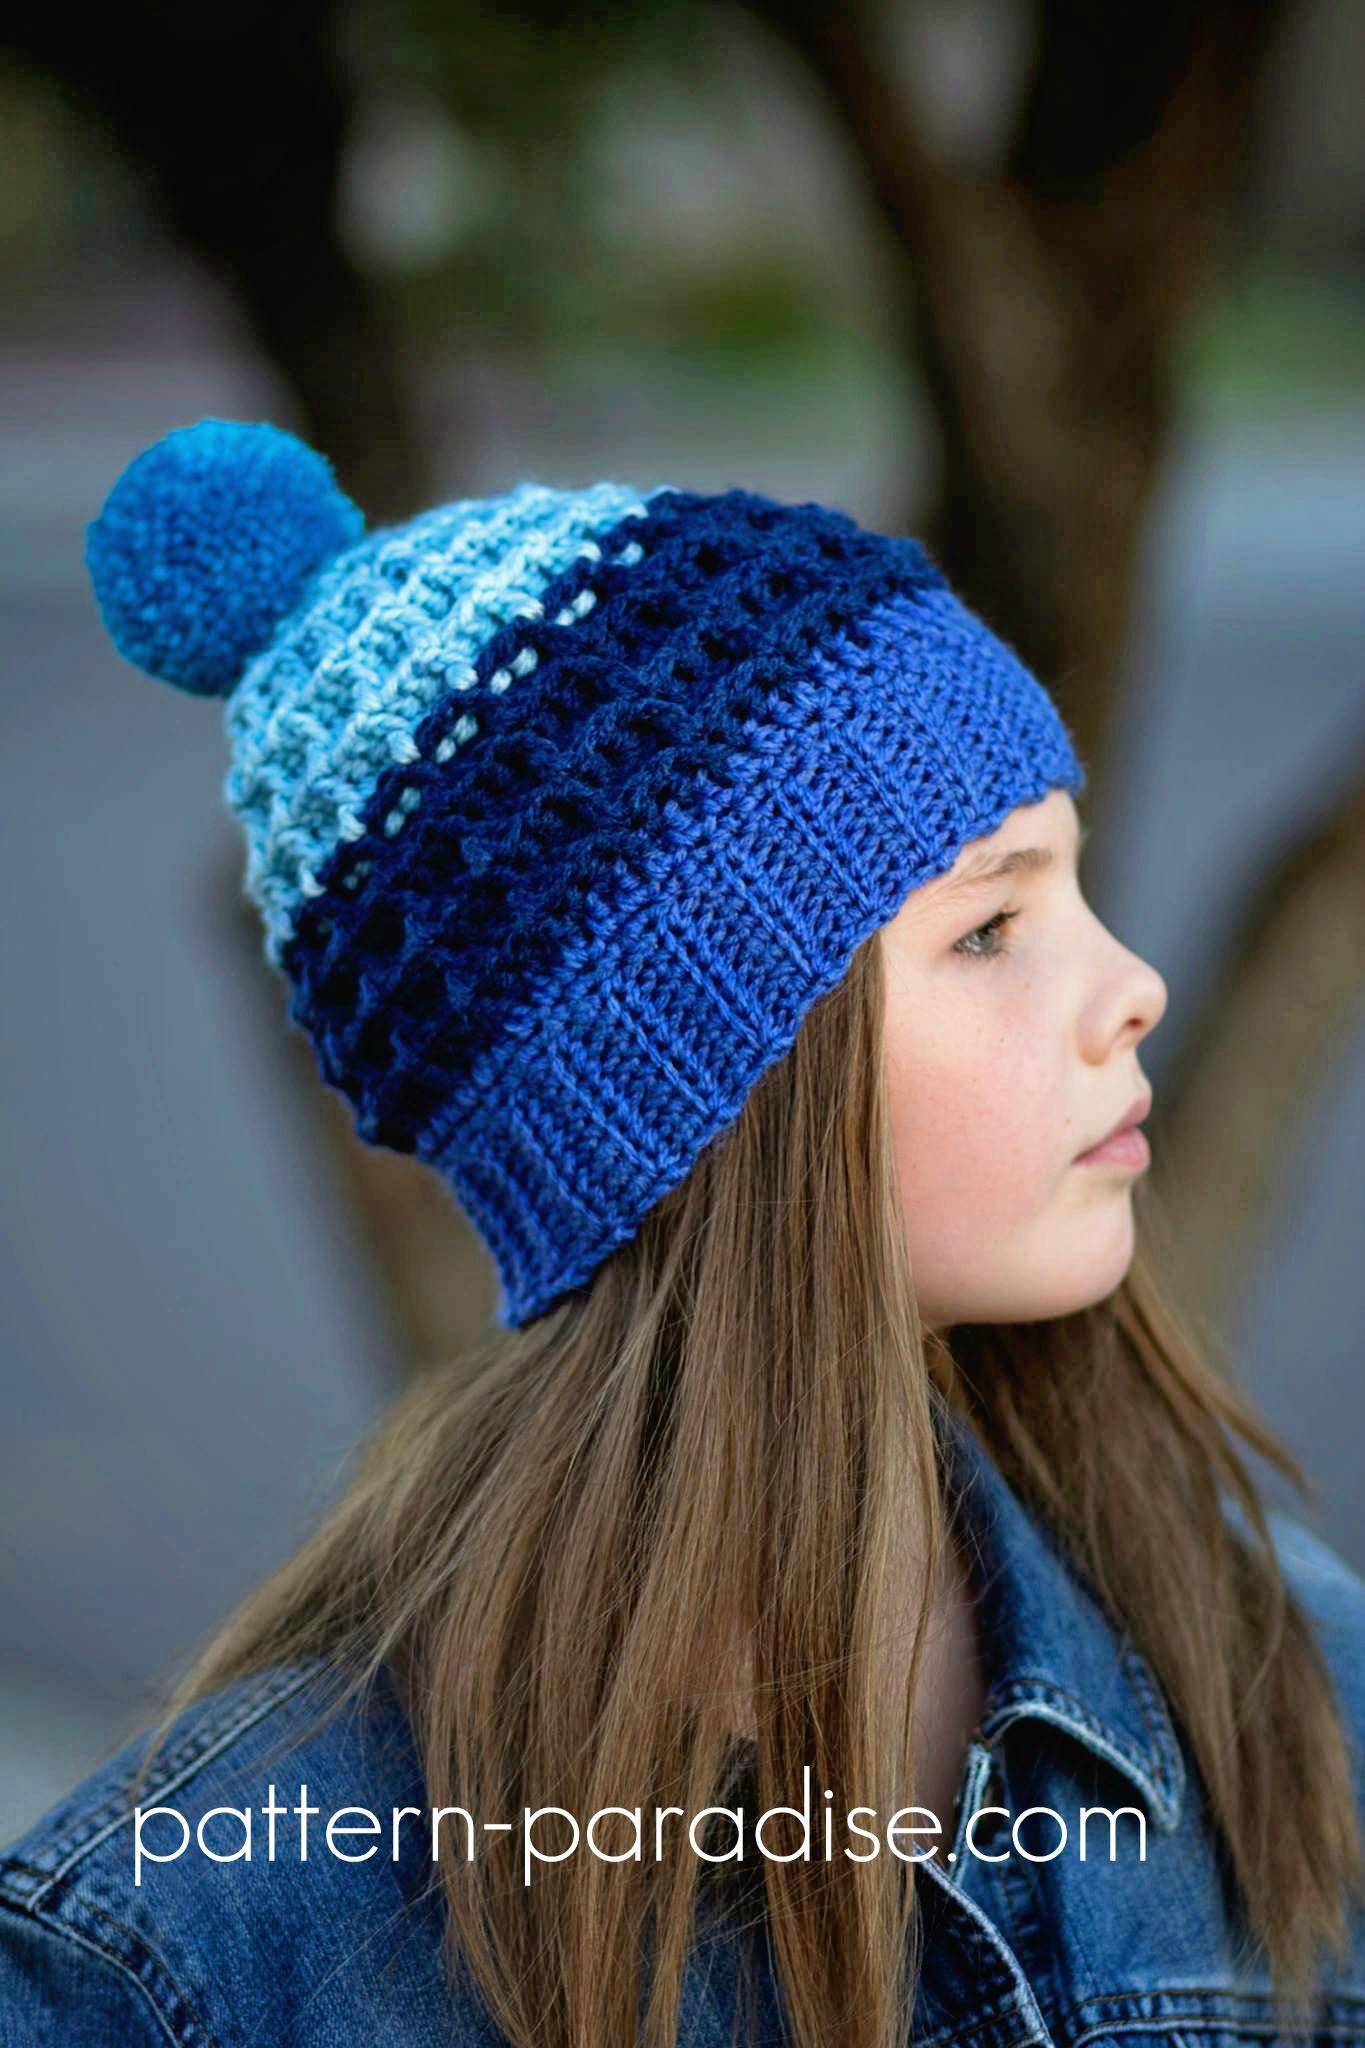 crochet beanie free crochet pattern: alpine nights beanie   pattern paradise jcdrtok